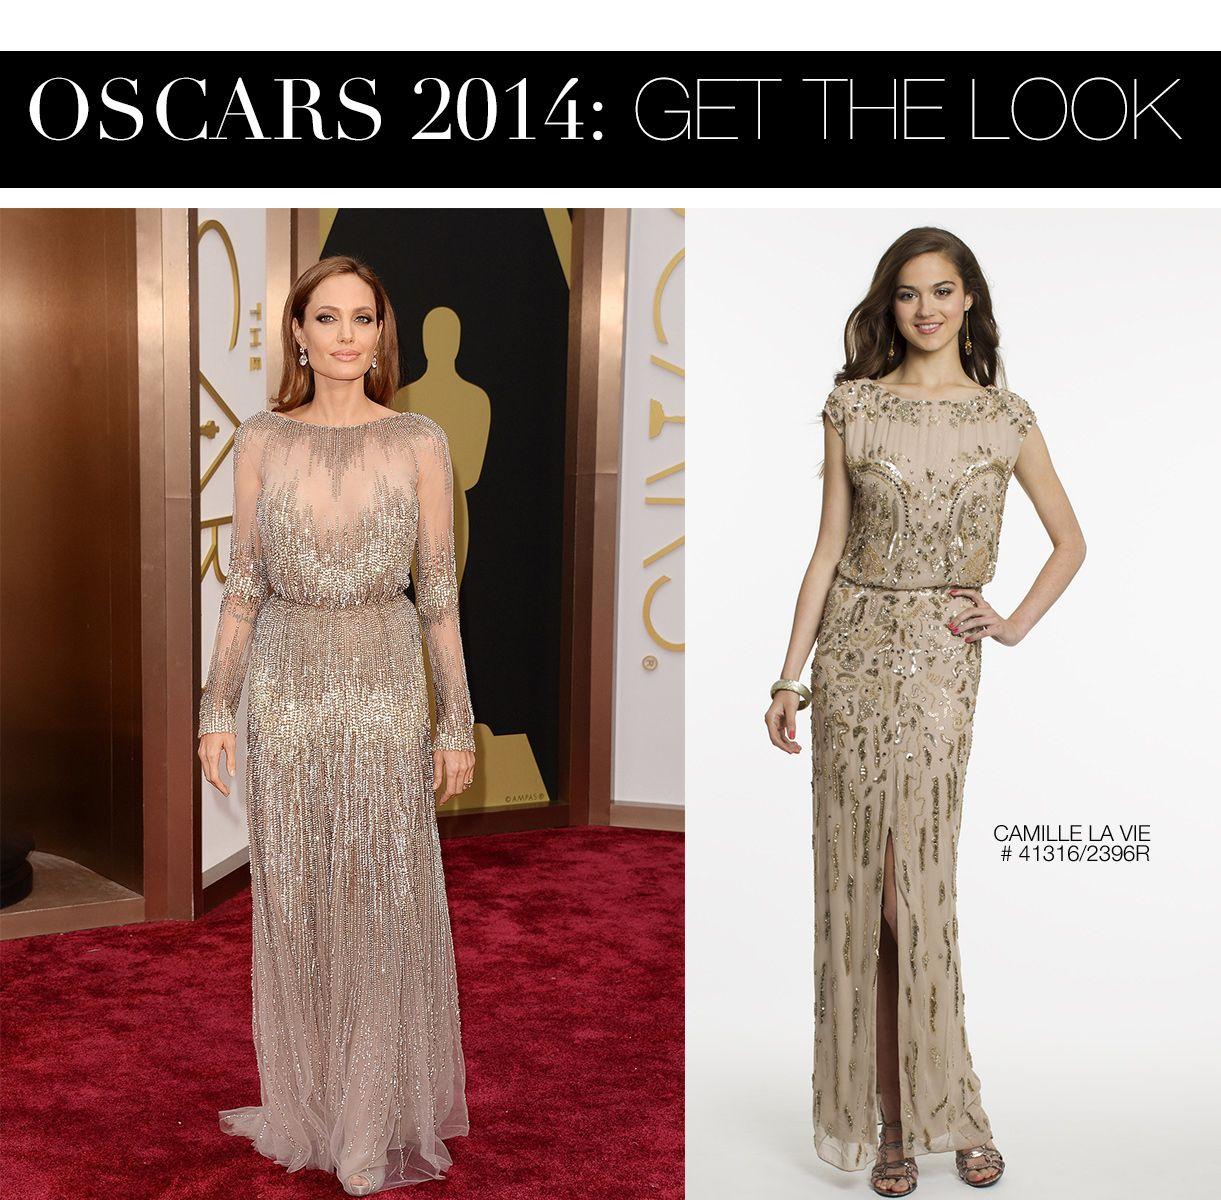 Angelina Jolie Oscar 2014 Dress Vs Camille La Vie Beaded Blouson Prom Dress Dresses Evening Dresses Long 2014 Dresses